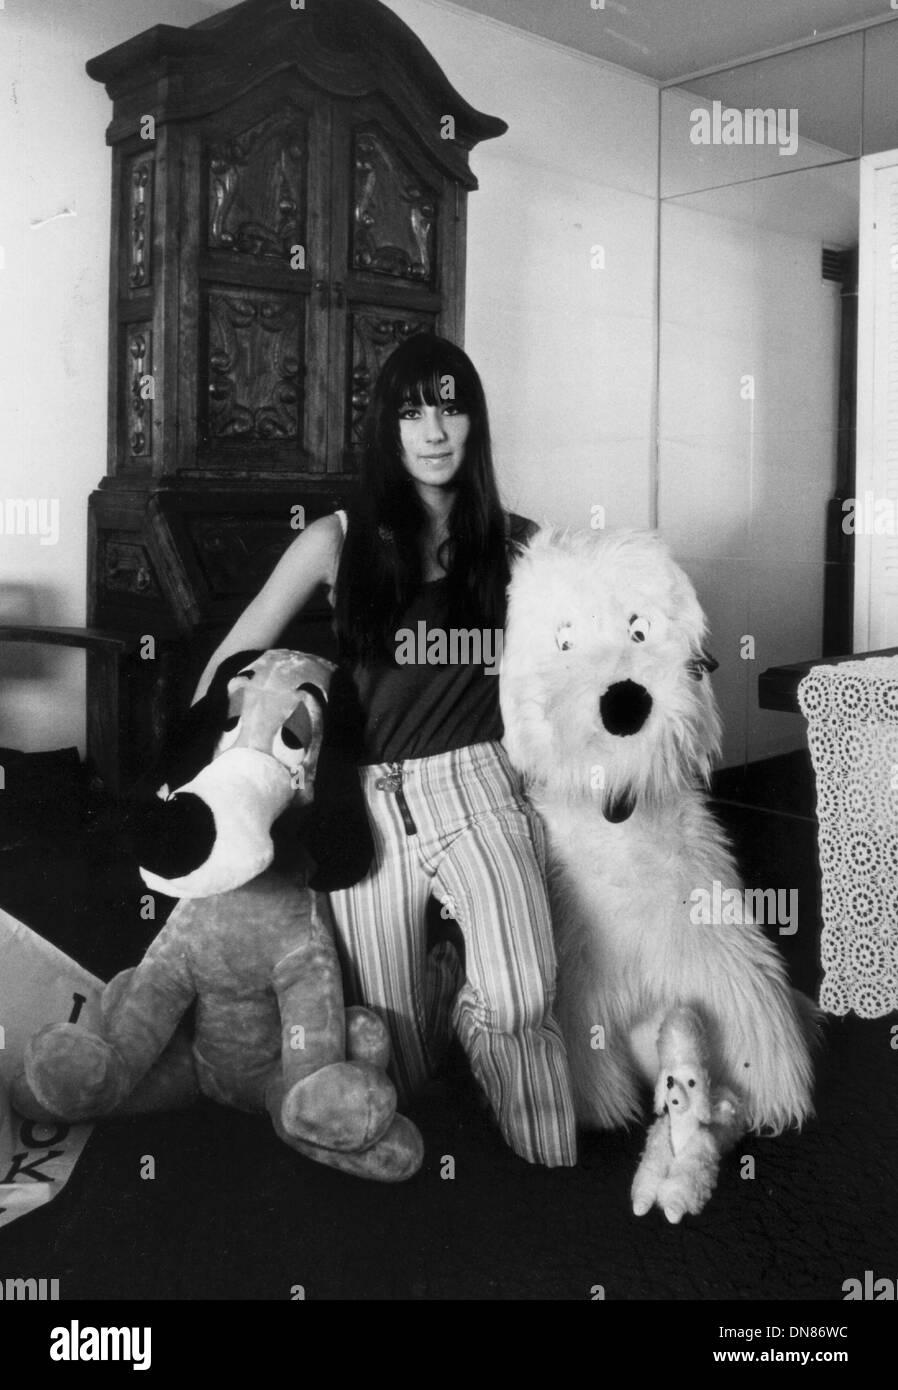 Agosto 26, 2002 - Cher. JAY THOMPSON/(Crédito Imagen: © Globe Photos/ZUMAPRESS.com) Imagen De Stock